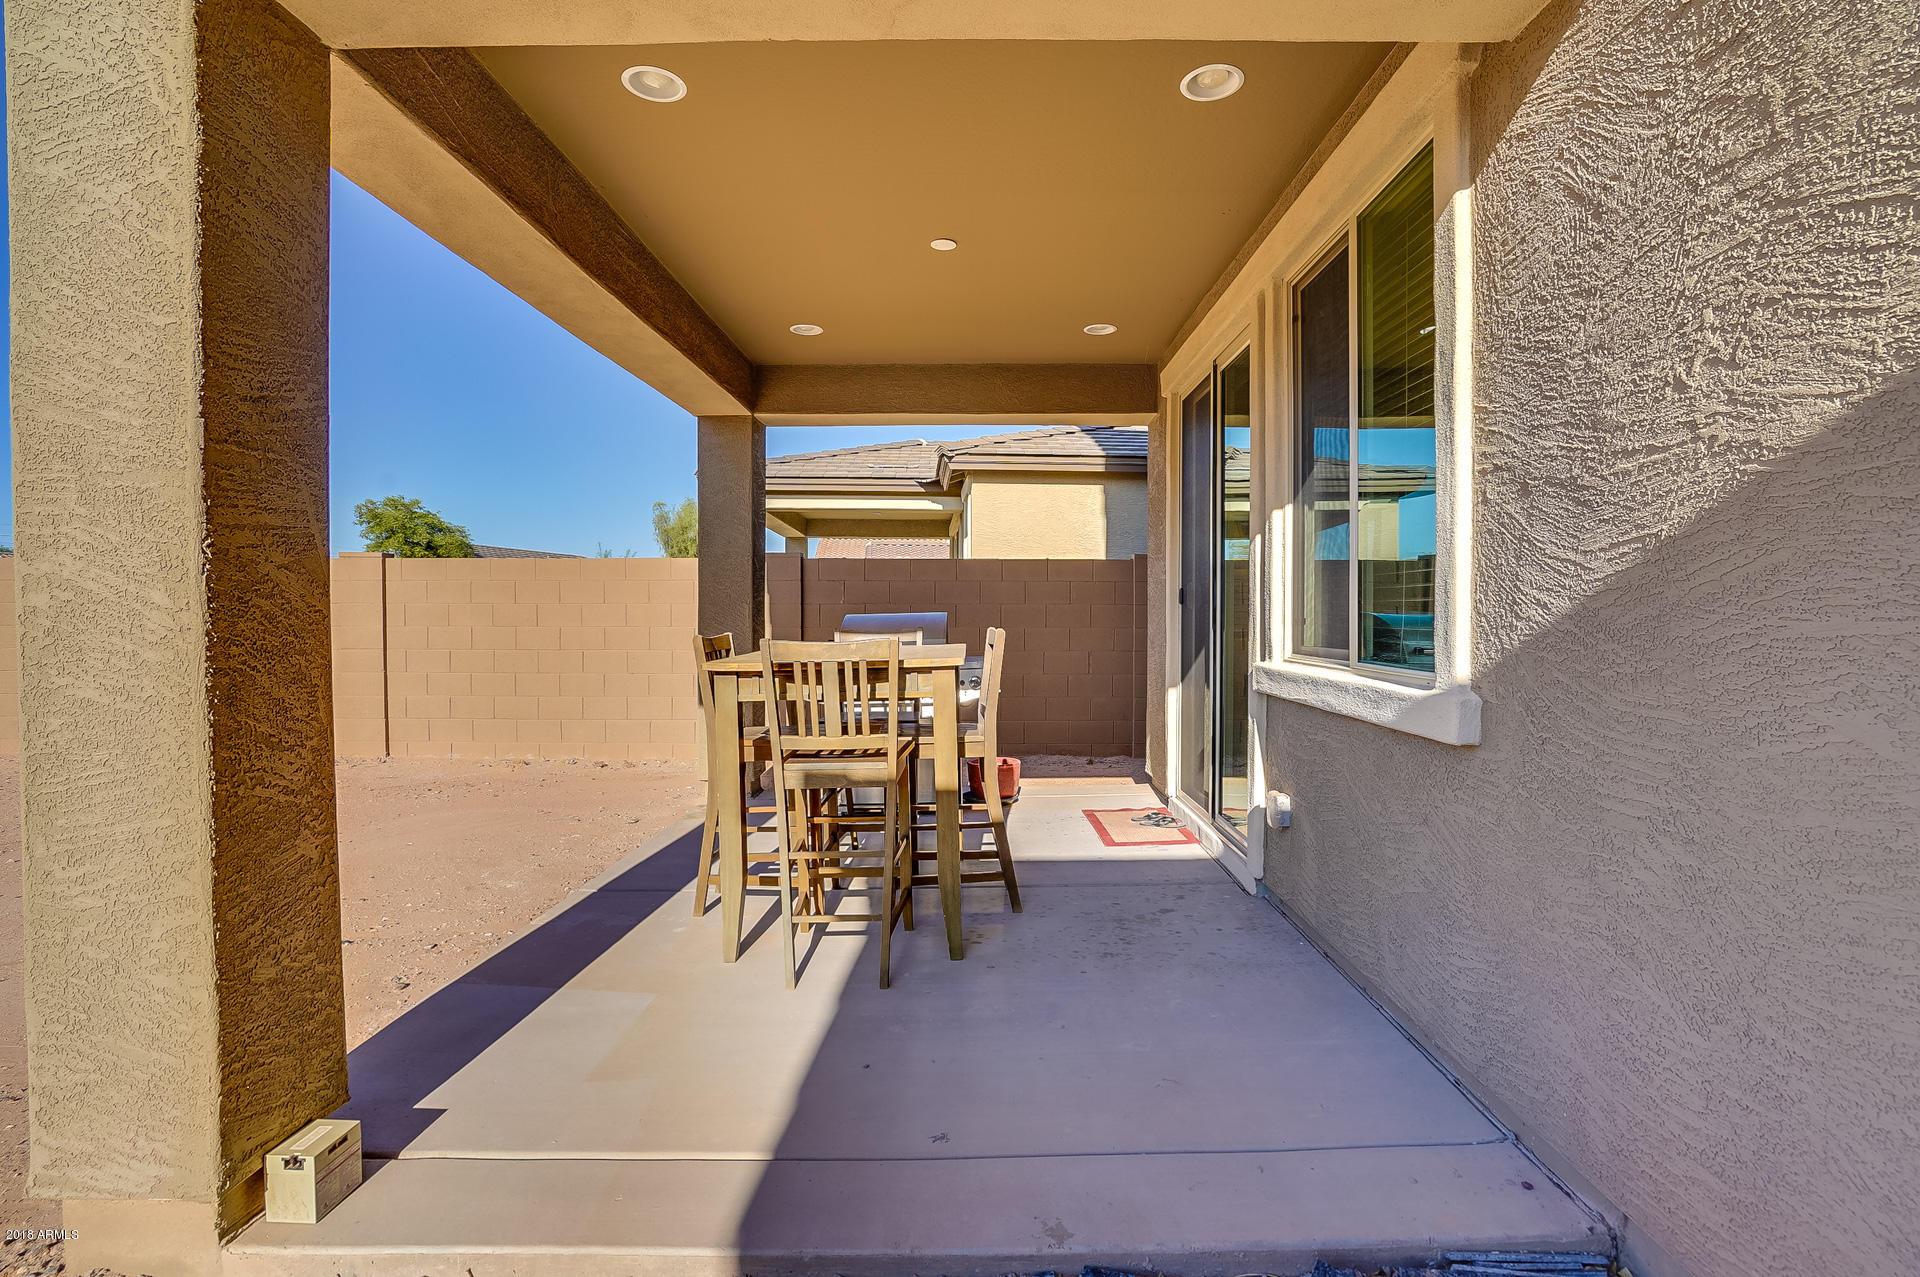 MLS 5813813 42196 W Cheyenne Drive, Maricopa, AZ 85138 Maricopa AZ Glennwilde